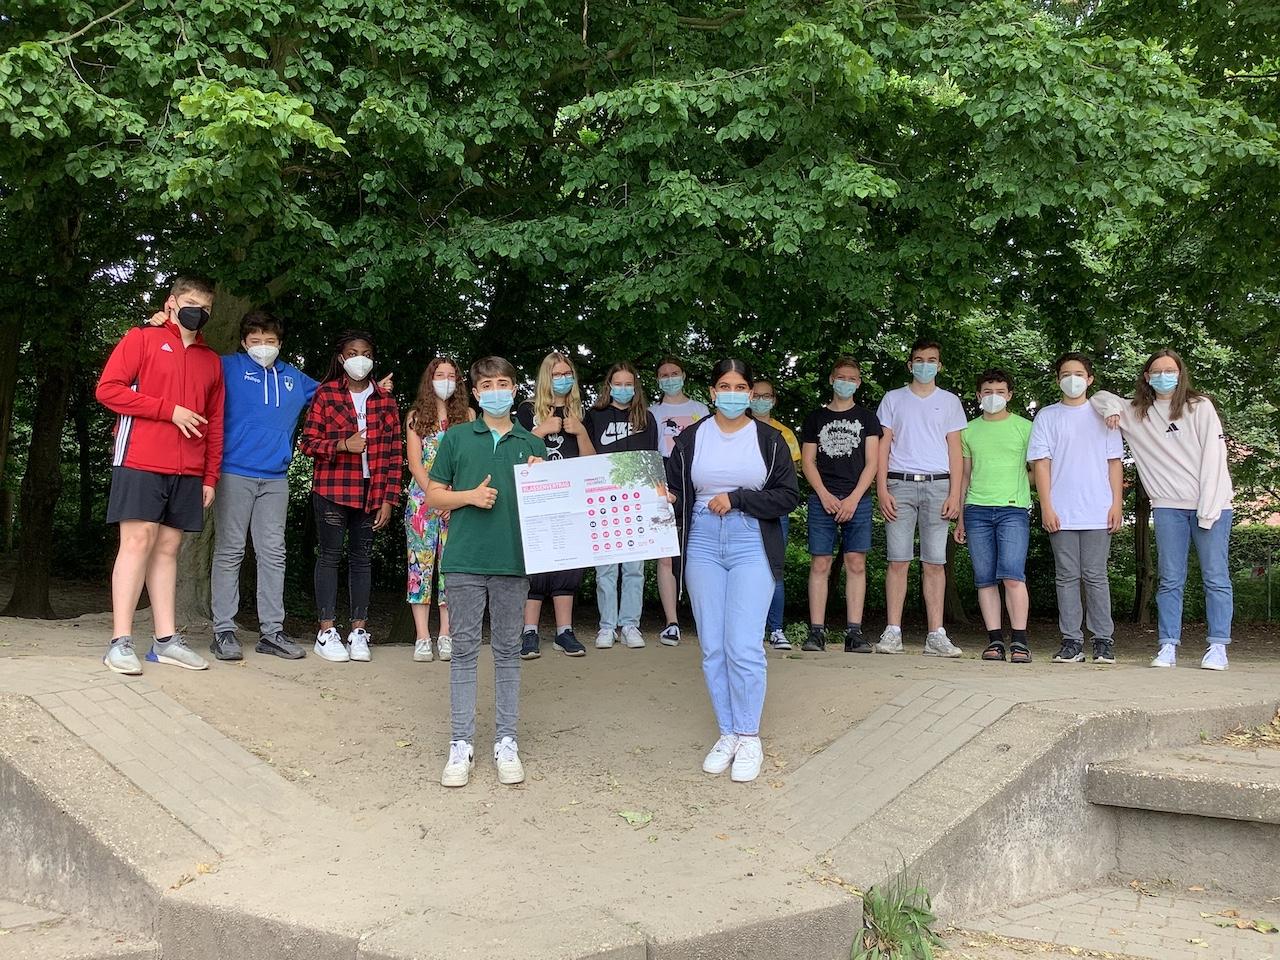 Saubere Lungen – volle Klassenkasse!